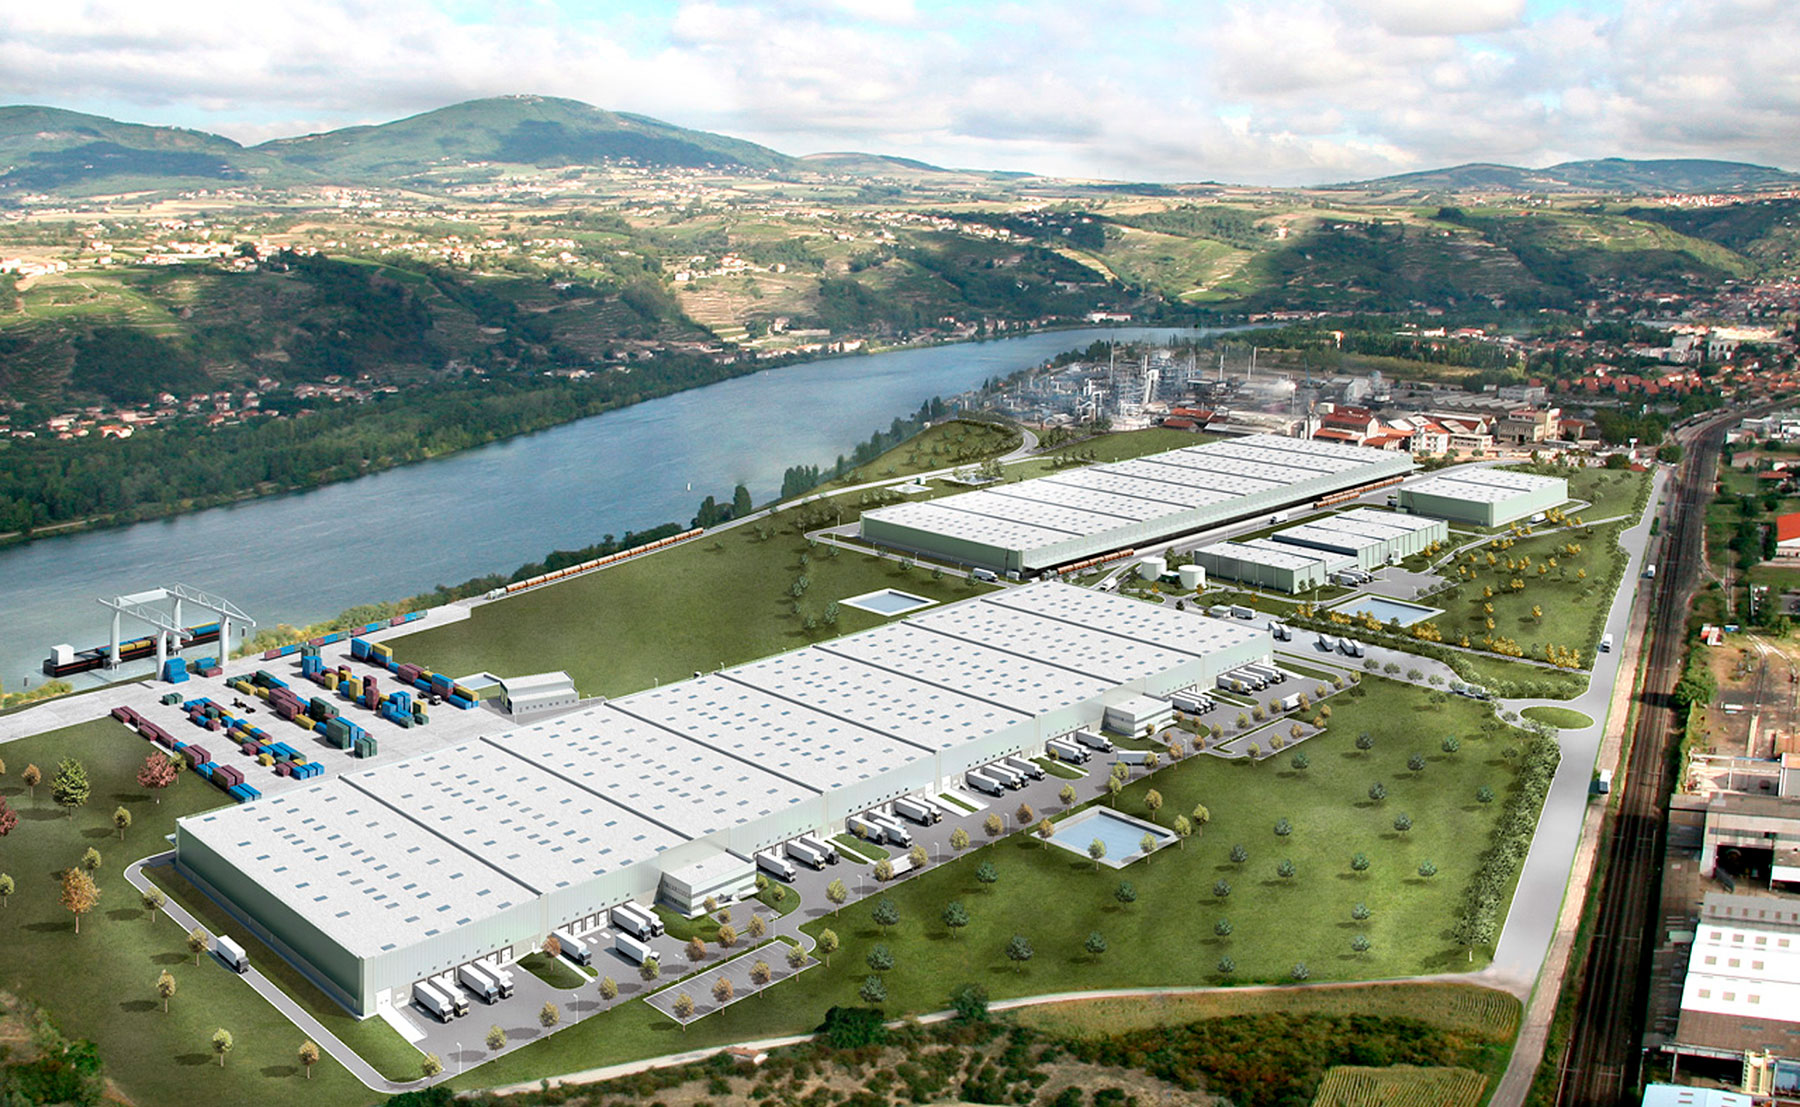 Tourmaline - Bâtiment industriel